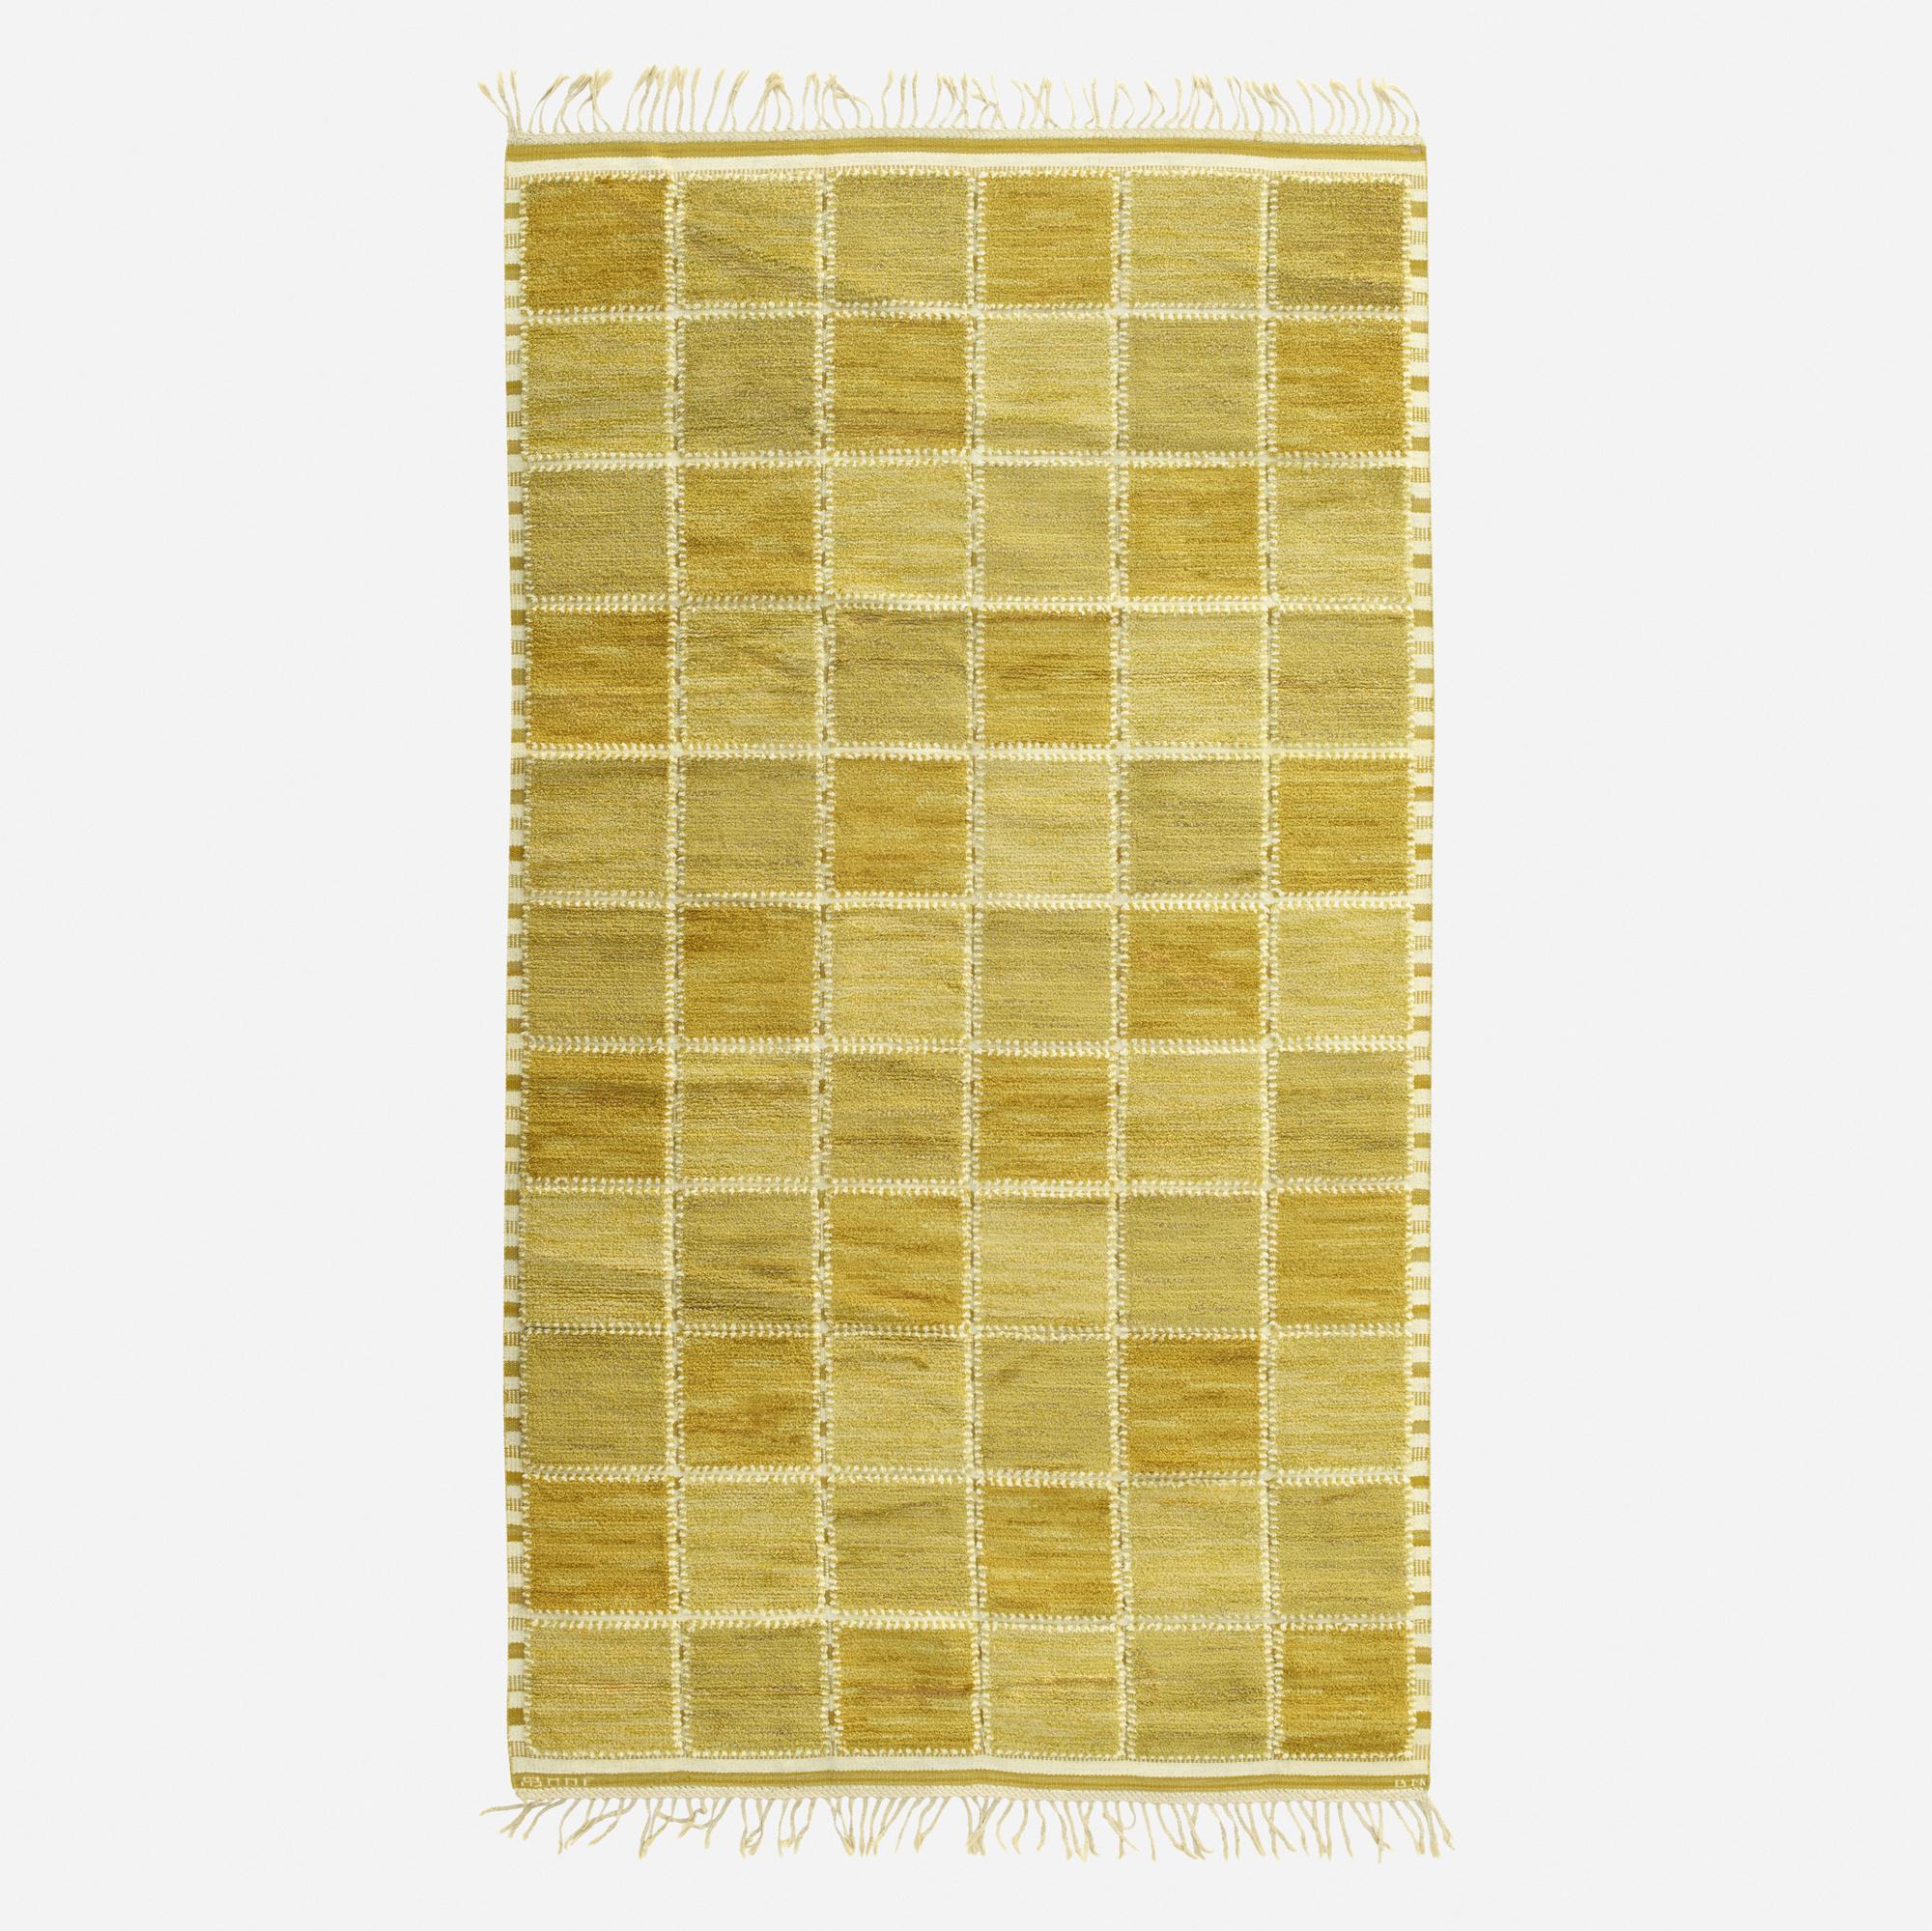 188: Barbro Nilsson / Gyllenrutan half-pile carpet (1 of 2)